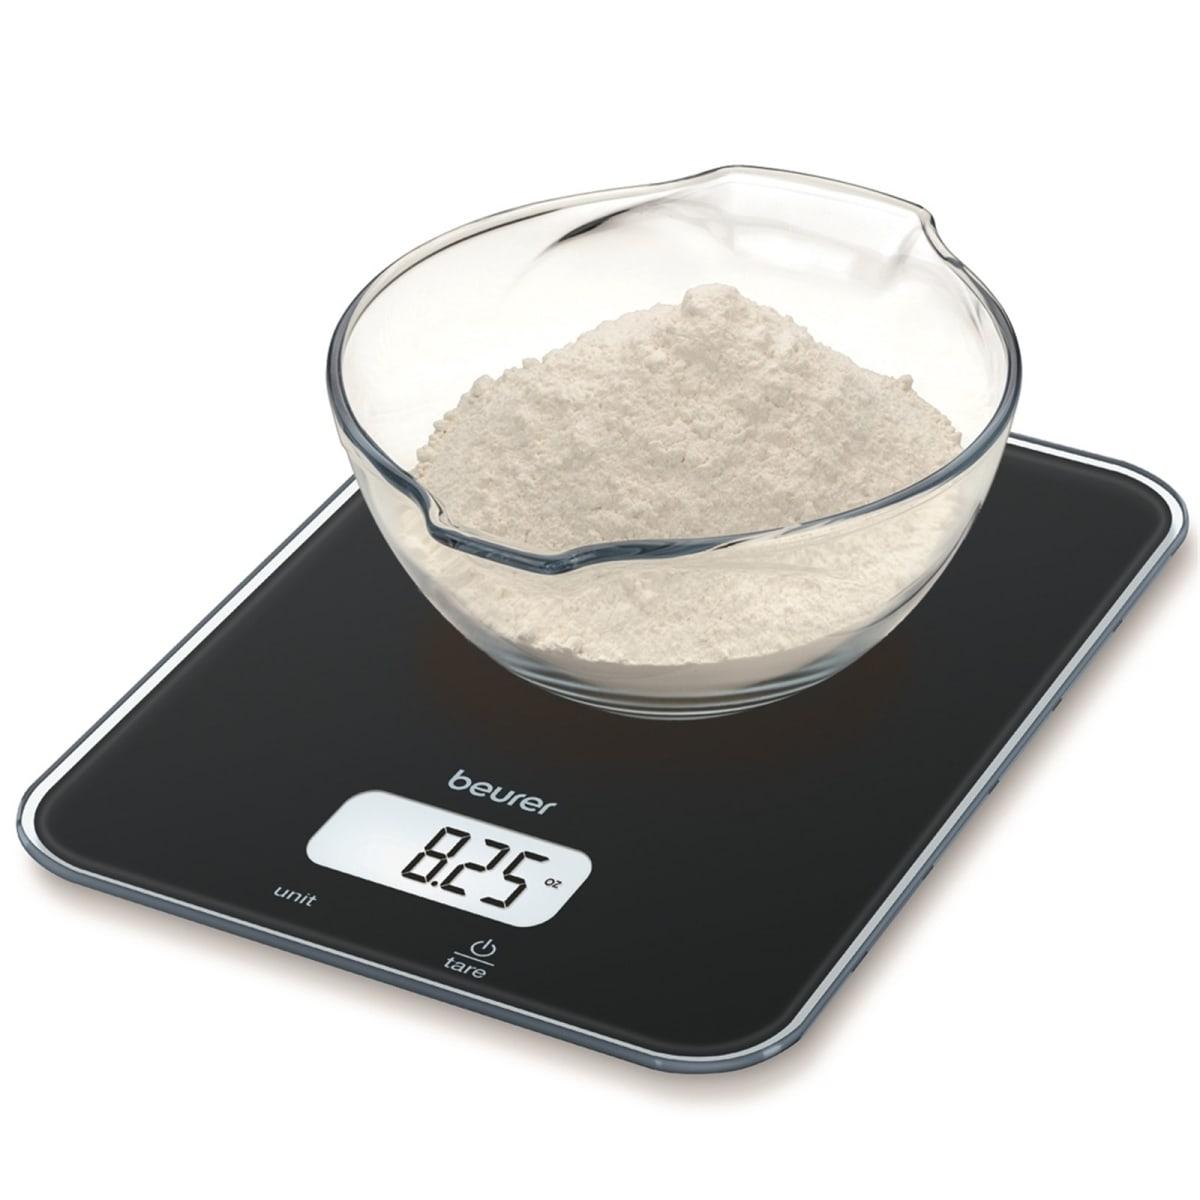 Multi-Function Digital Kitchen Scale- .49, Original Price .99